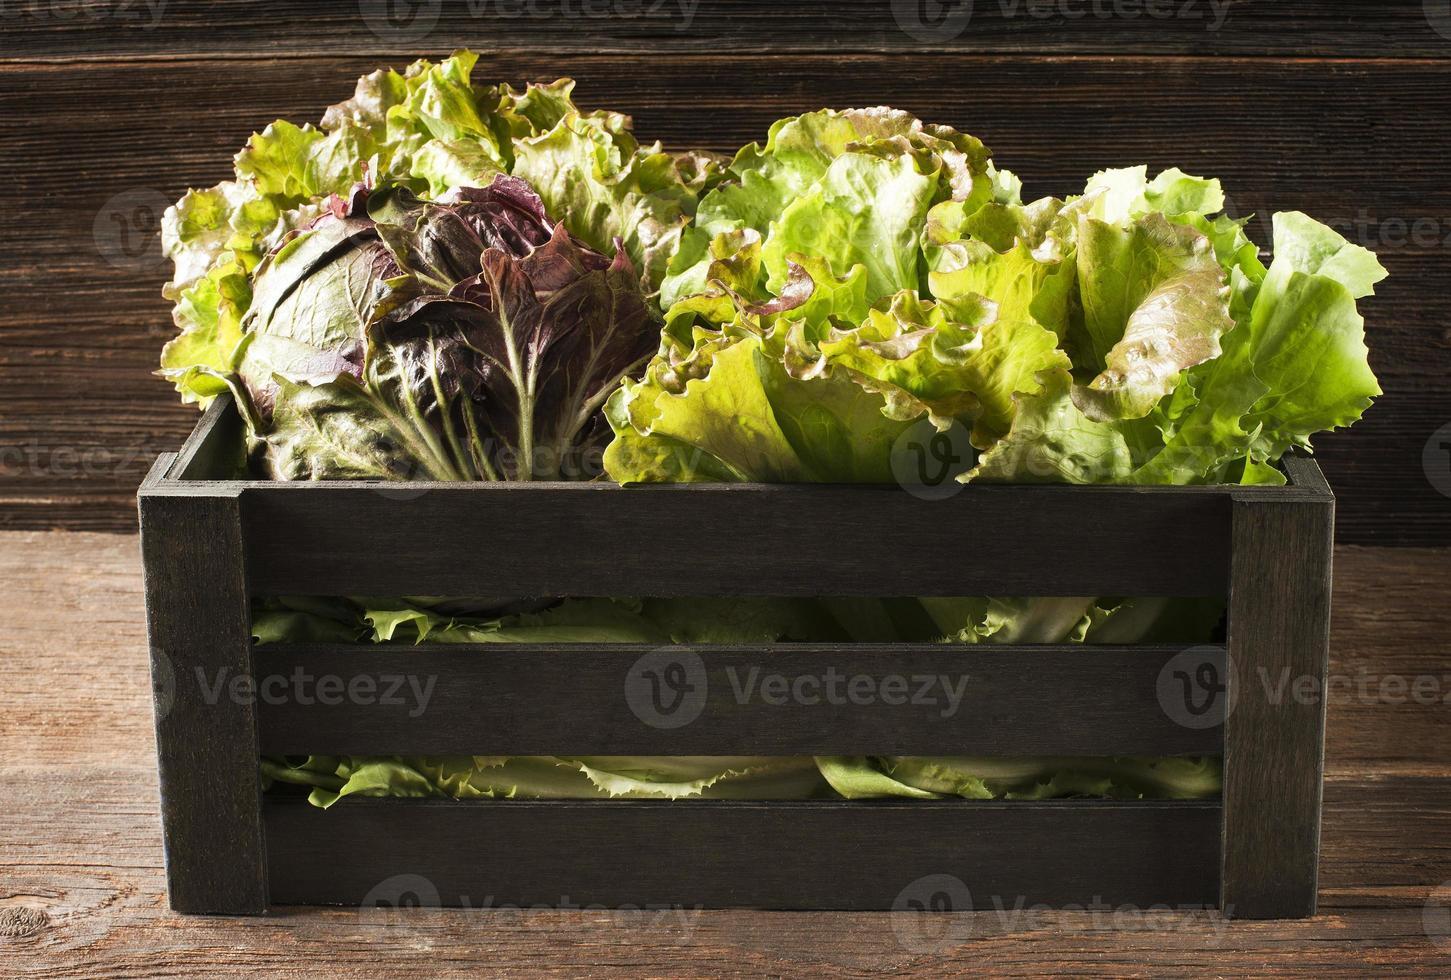 Salad in box photo